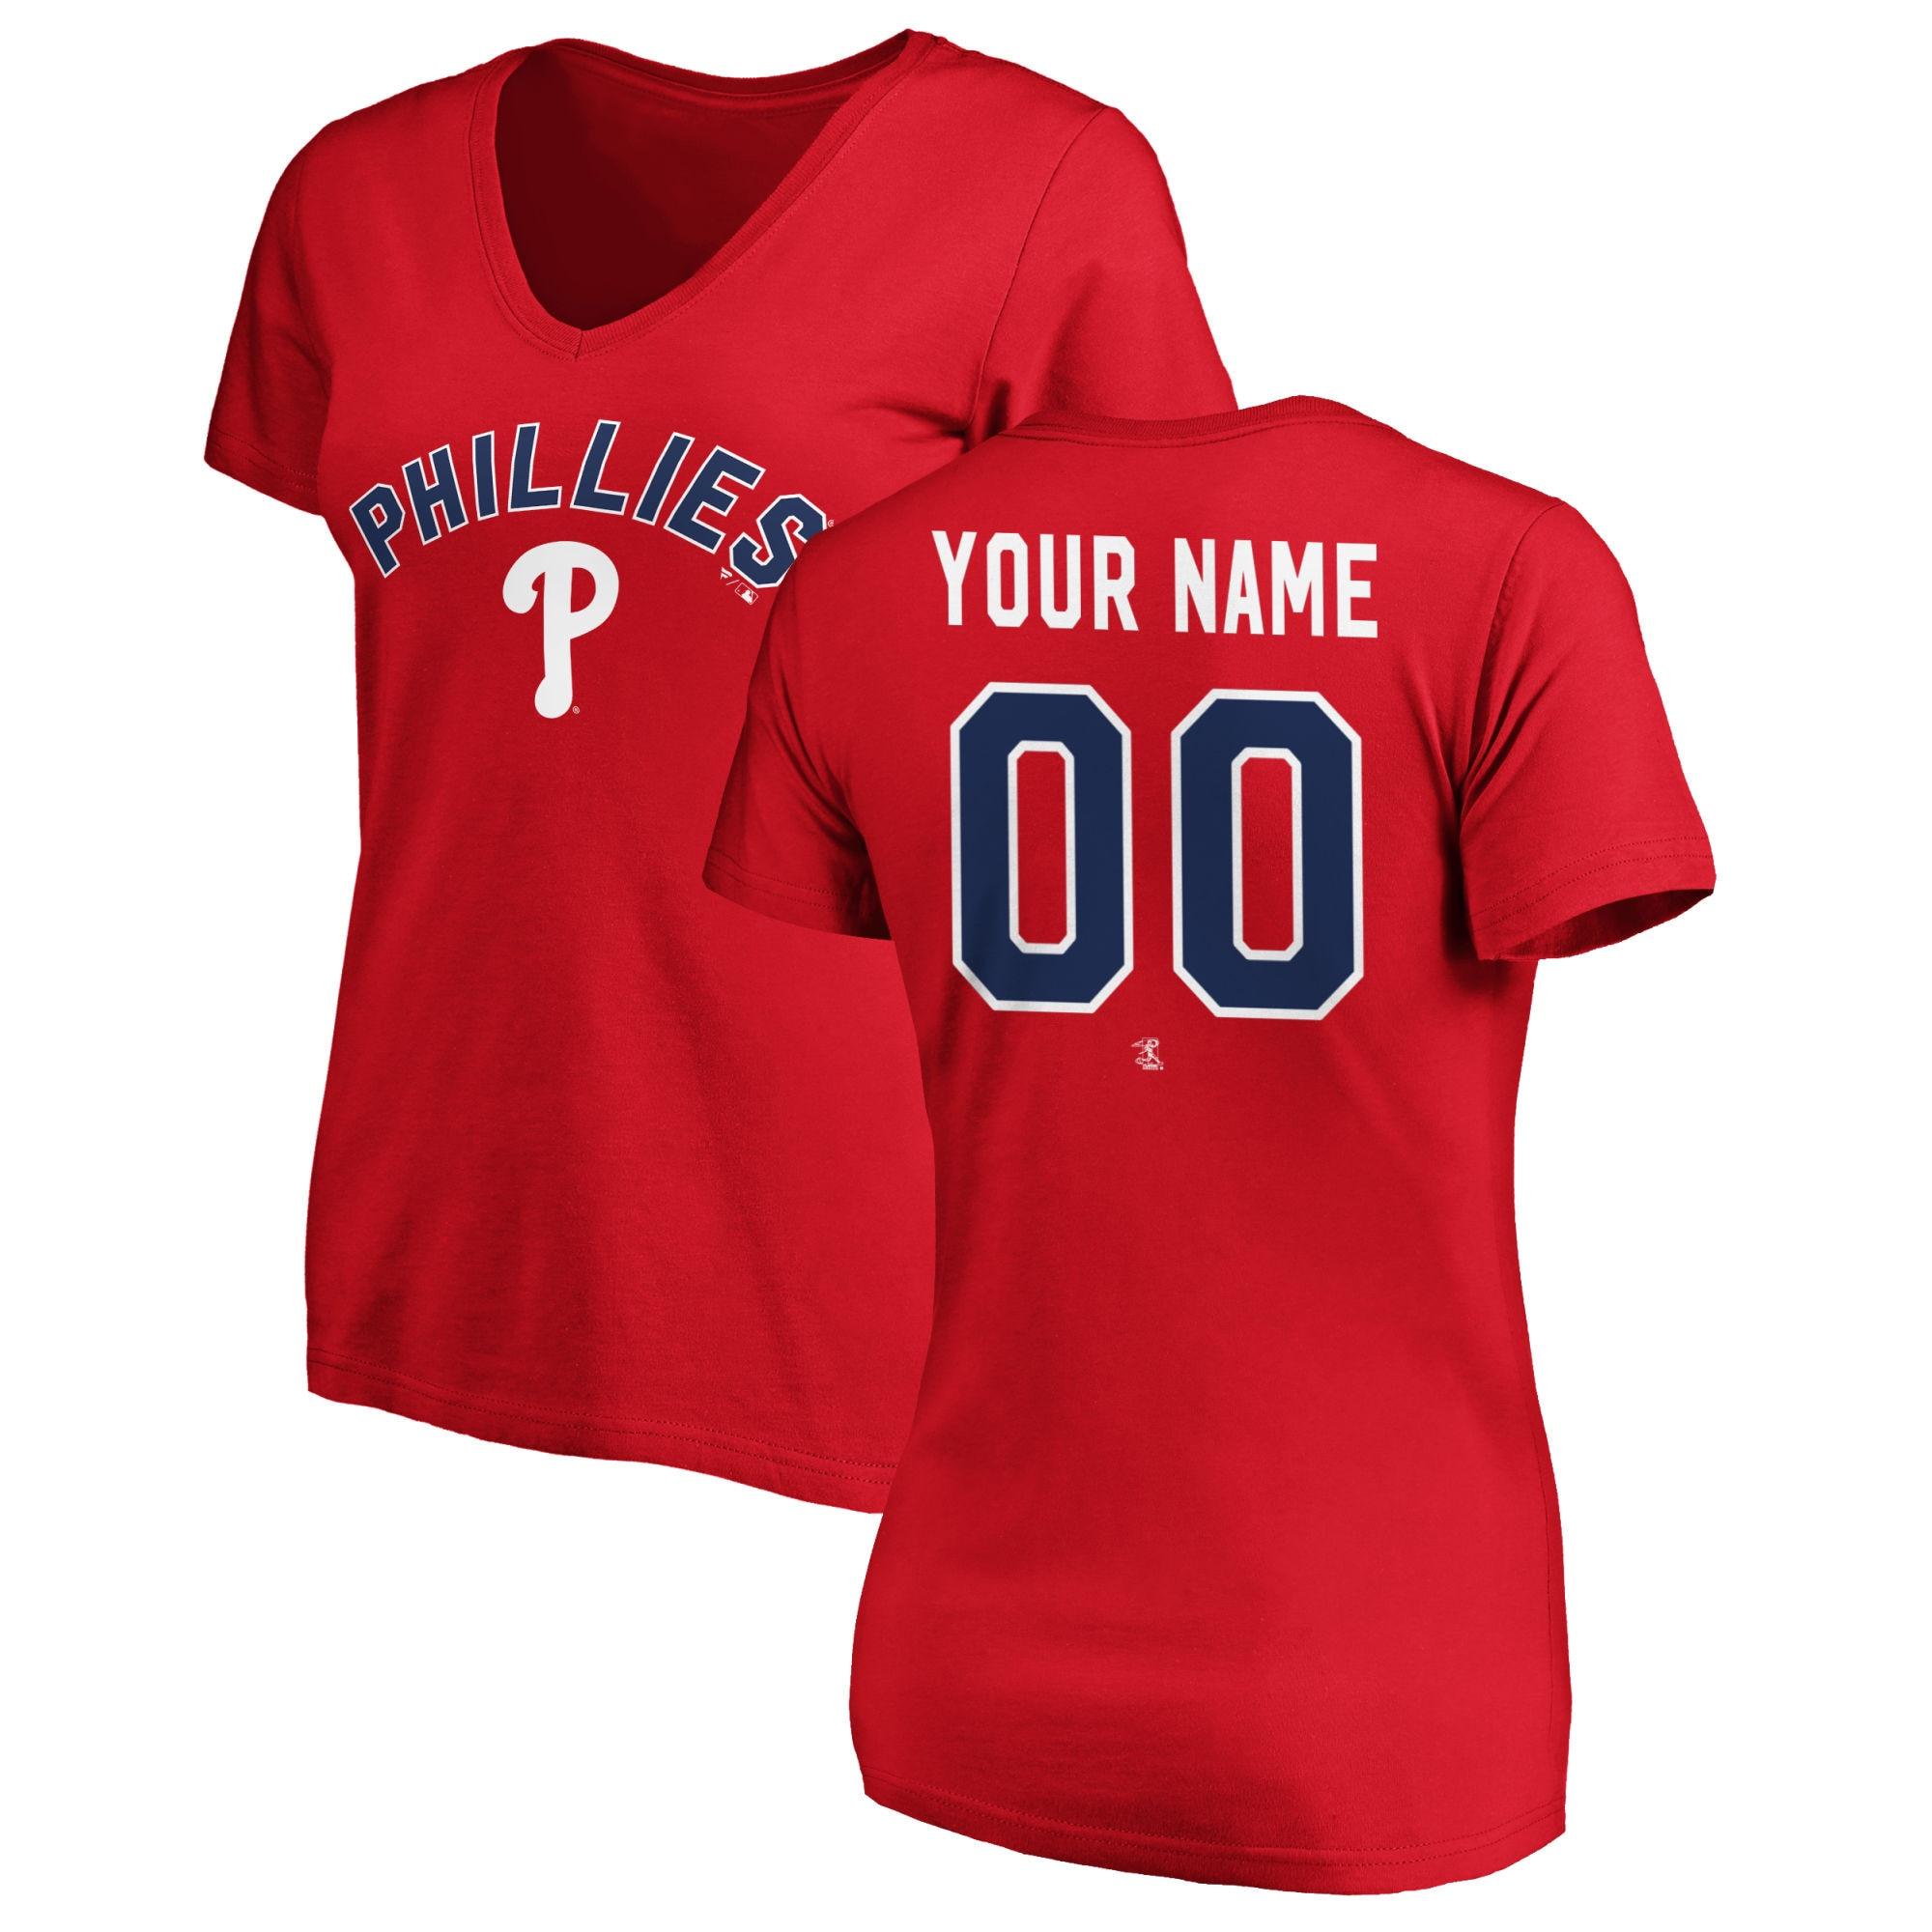 Philadelphia Phillies Fanatics Branded Women's Personalized Winning Streak Name & Number Slim Fit V-Neck T-Shirt - Red